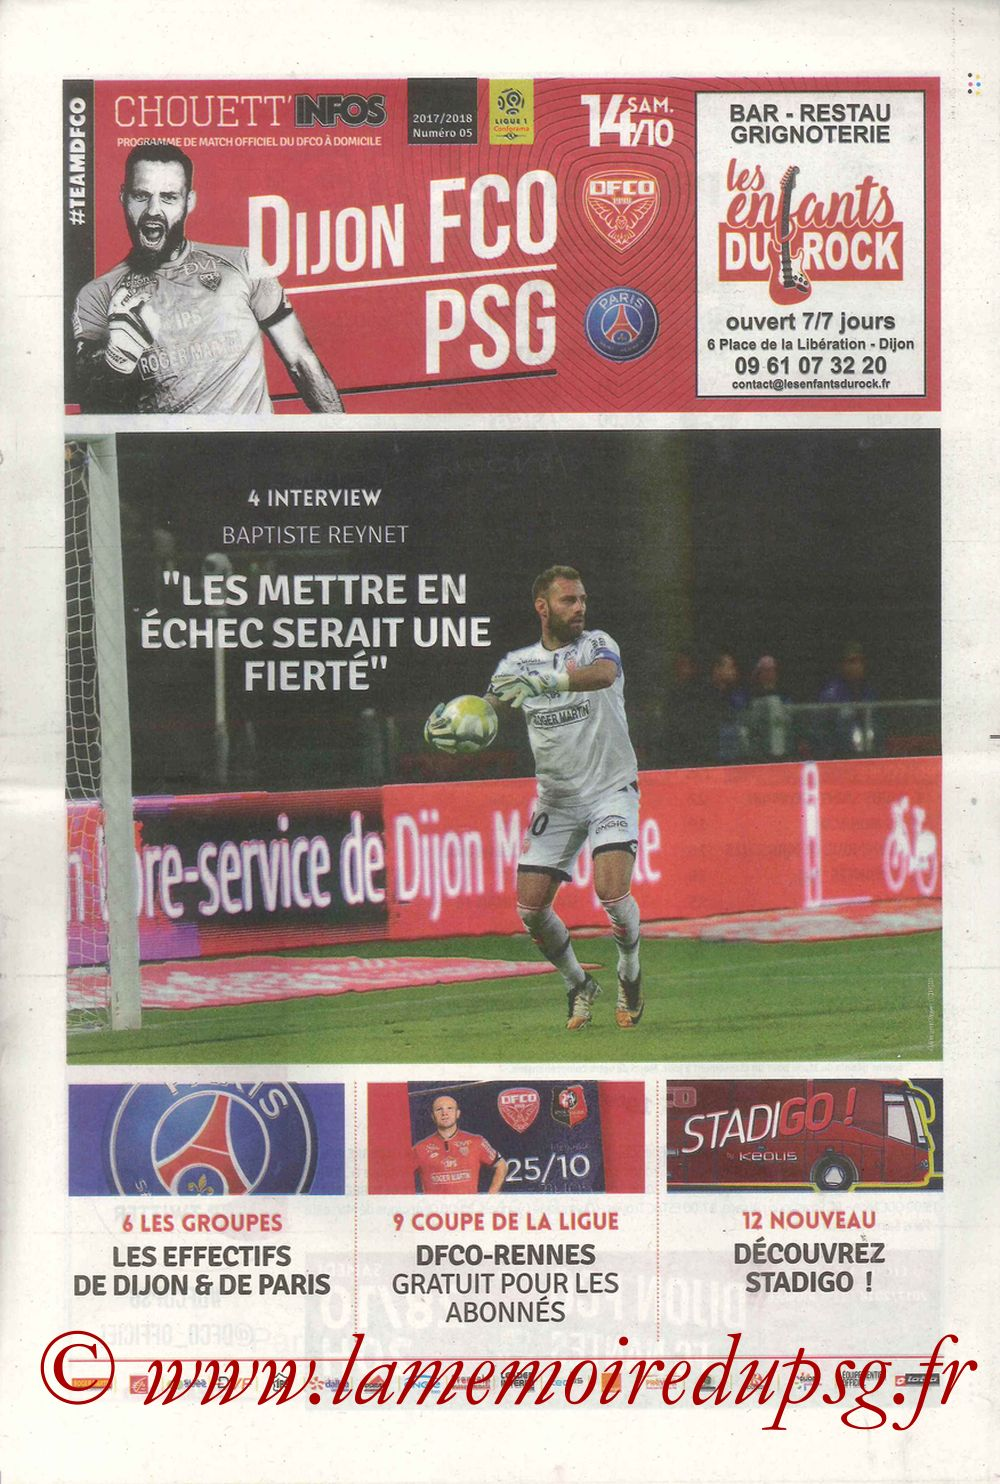 2017-10-14  Dijon-PSG (9ème L1, Chouett'Infos N°5)